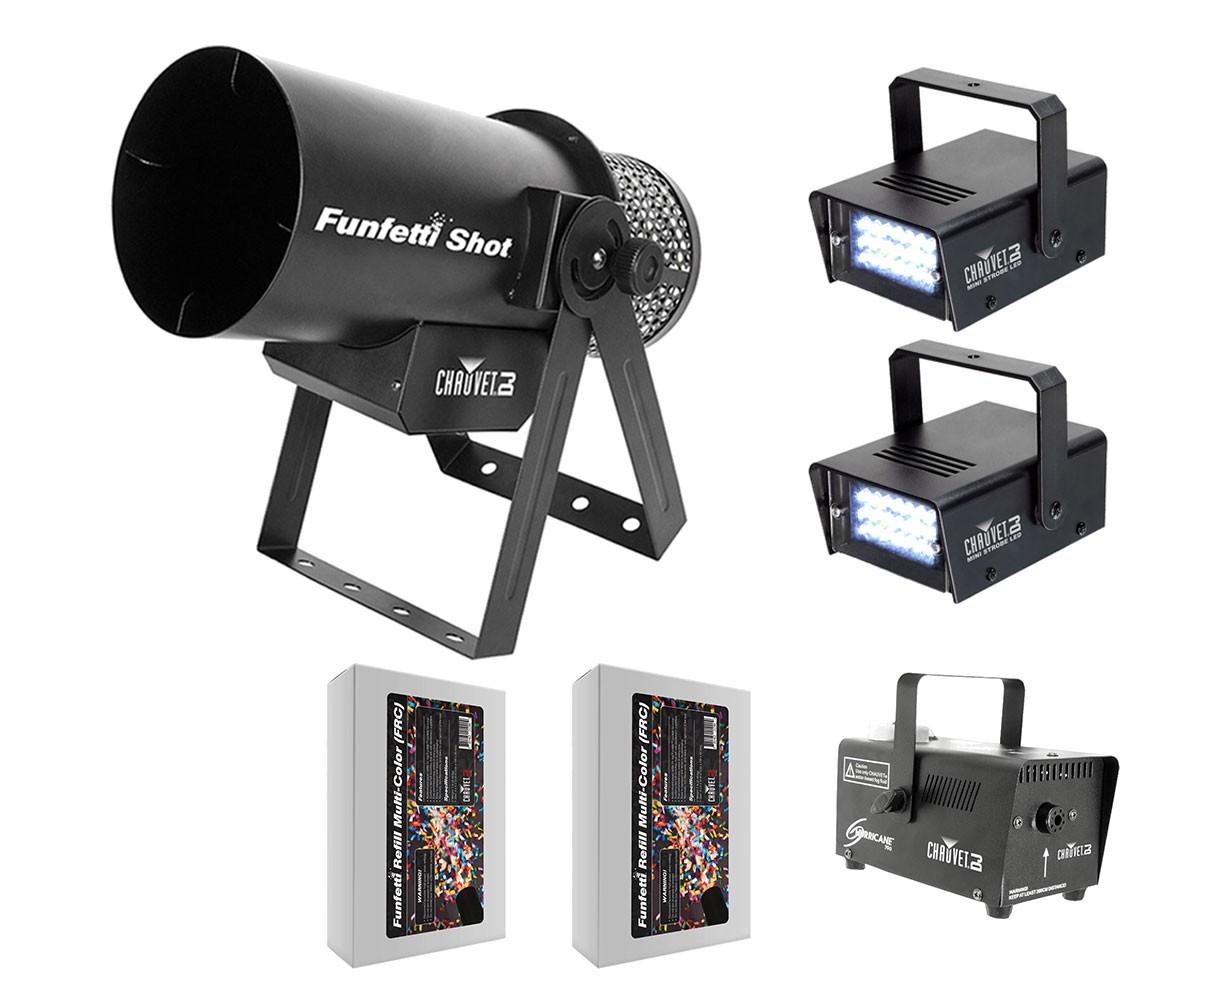 Chauvet Funfetti Shot + Fog Machine + Strobe Lights + 2x Color Confetti